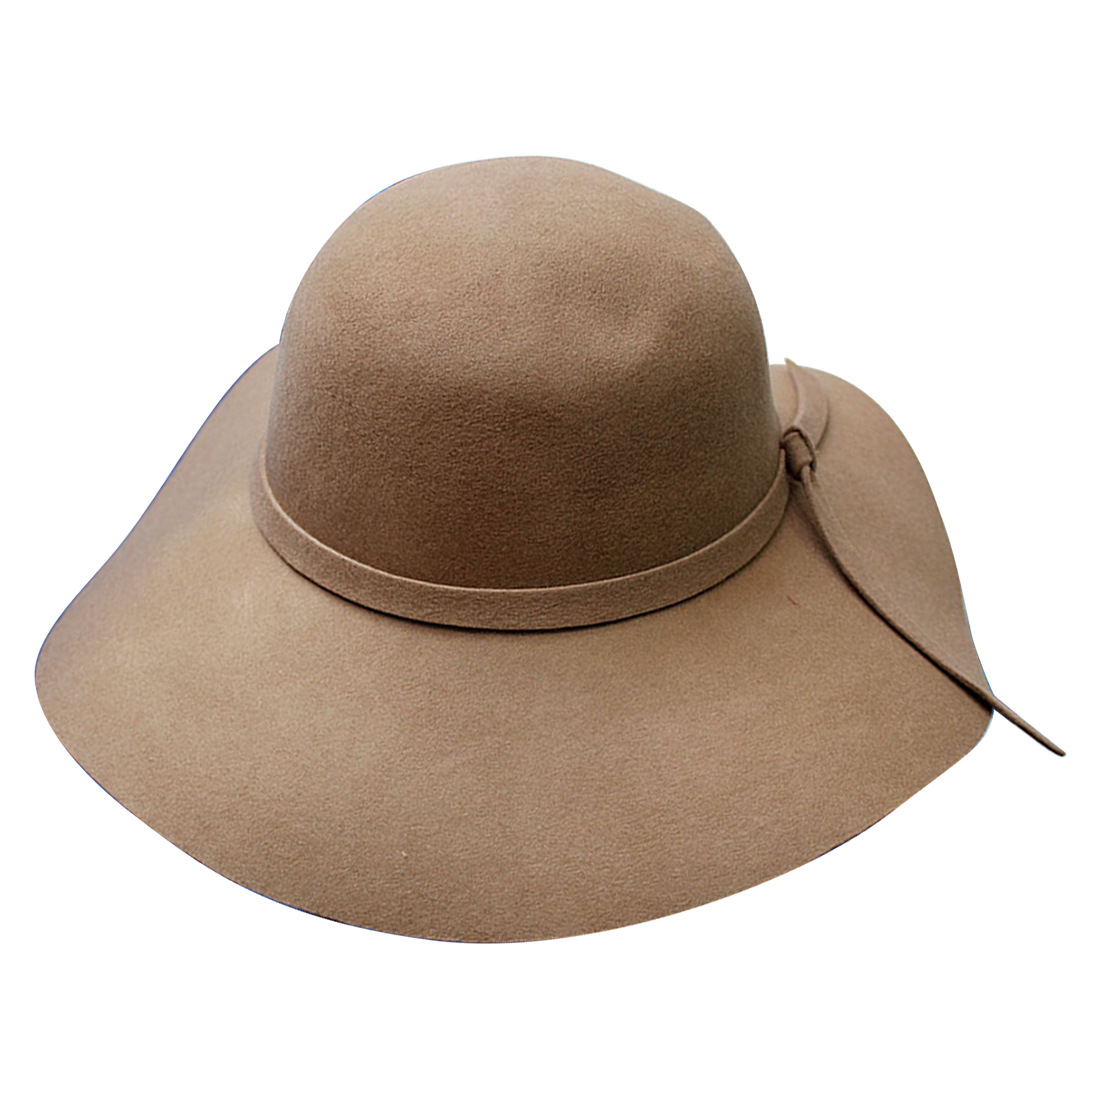 6bf58638c0b8f Fashion Floppy Hats Vintage Woolen-like Felt Hat Female Autumn Winter Waves  Large Brim bonnet